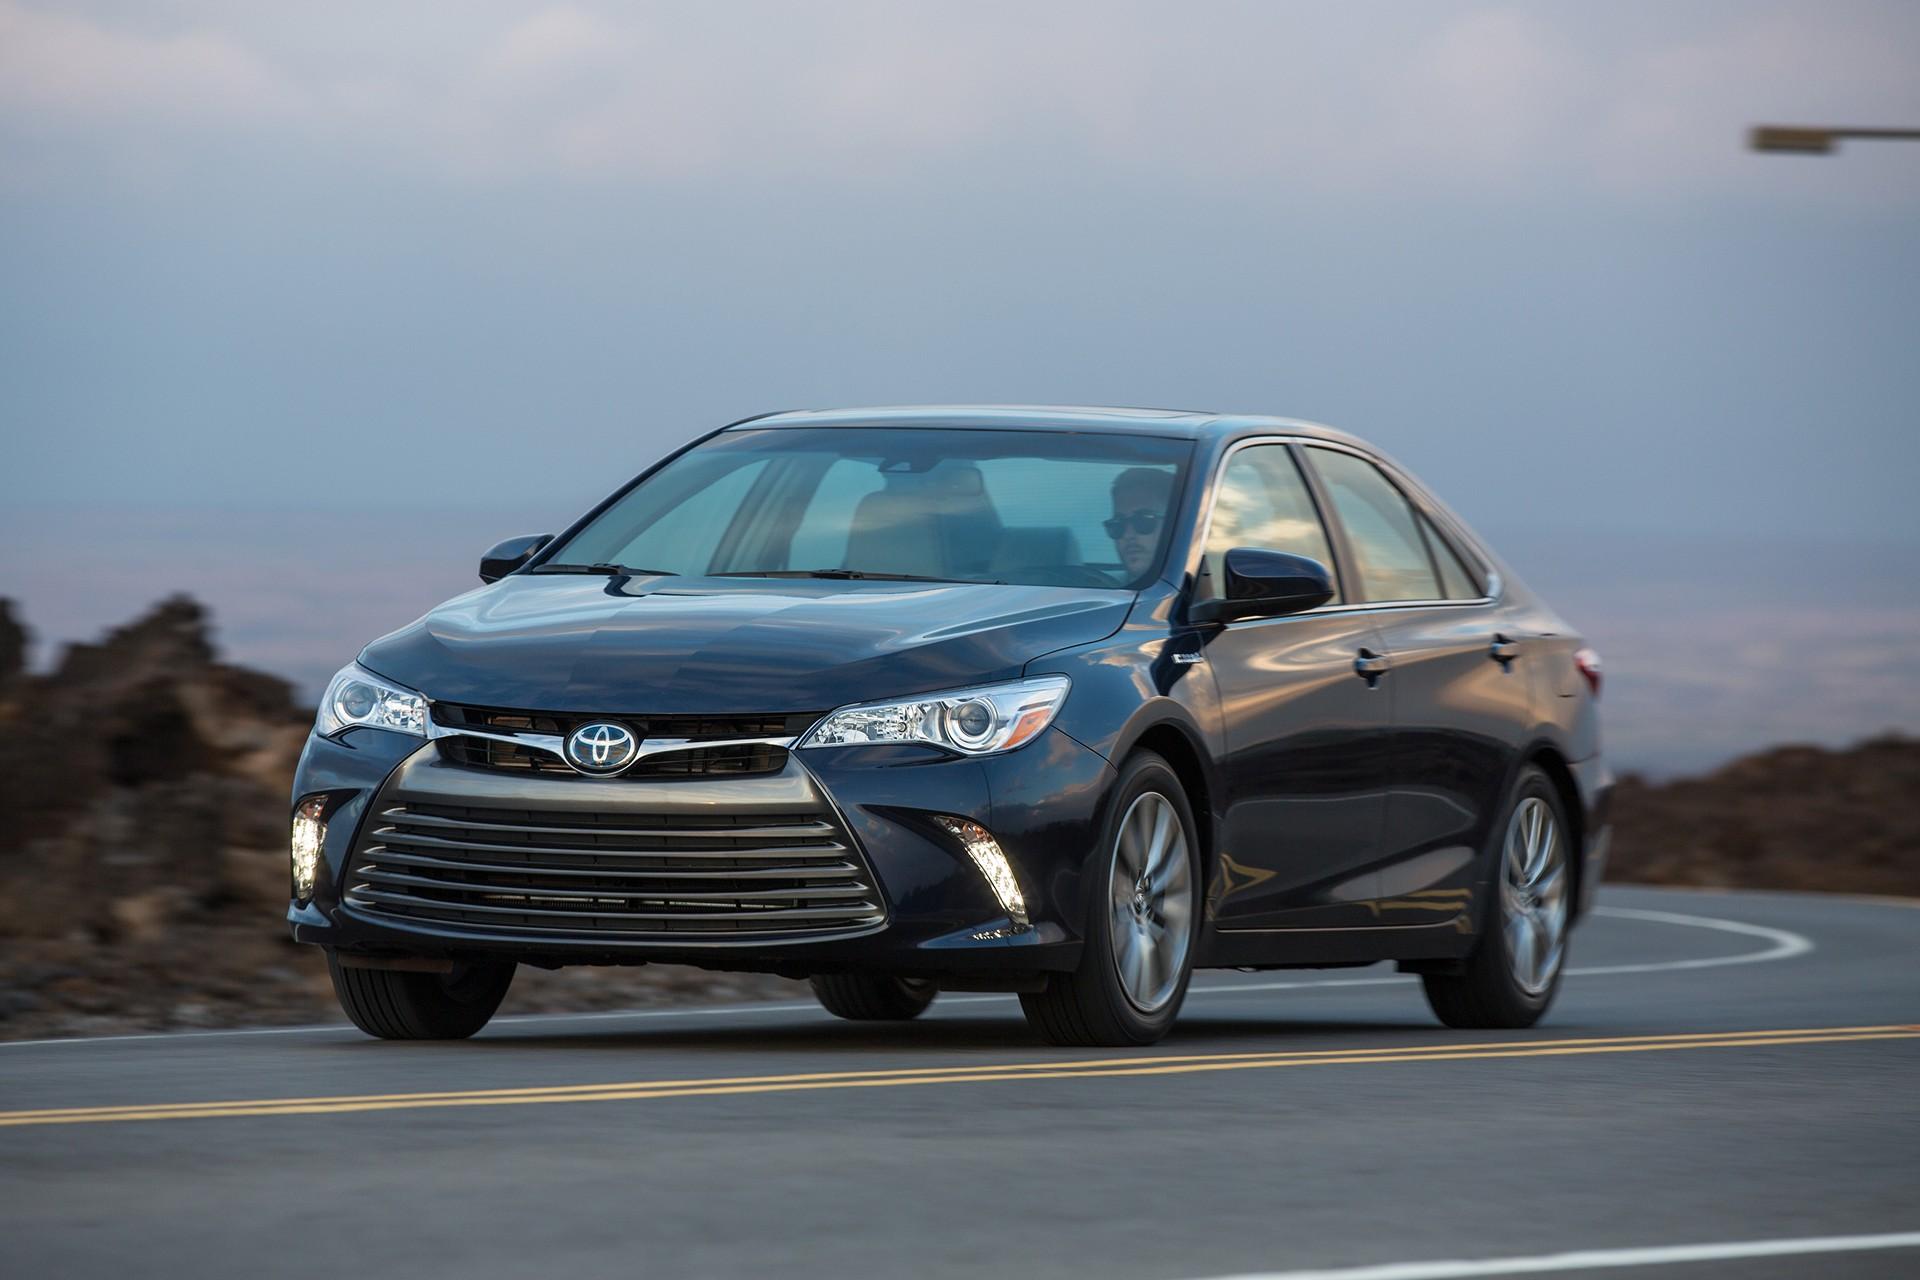 2016 Toyota Camry Hybrid © Toyota Motor Corporation